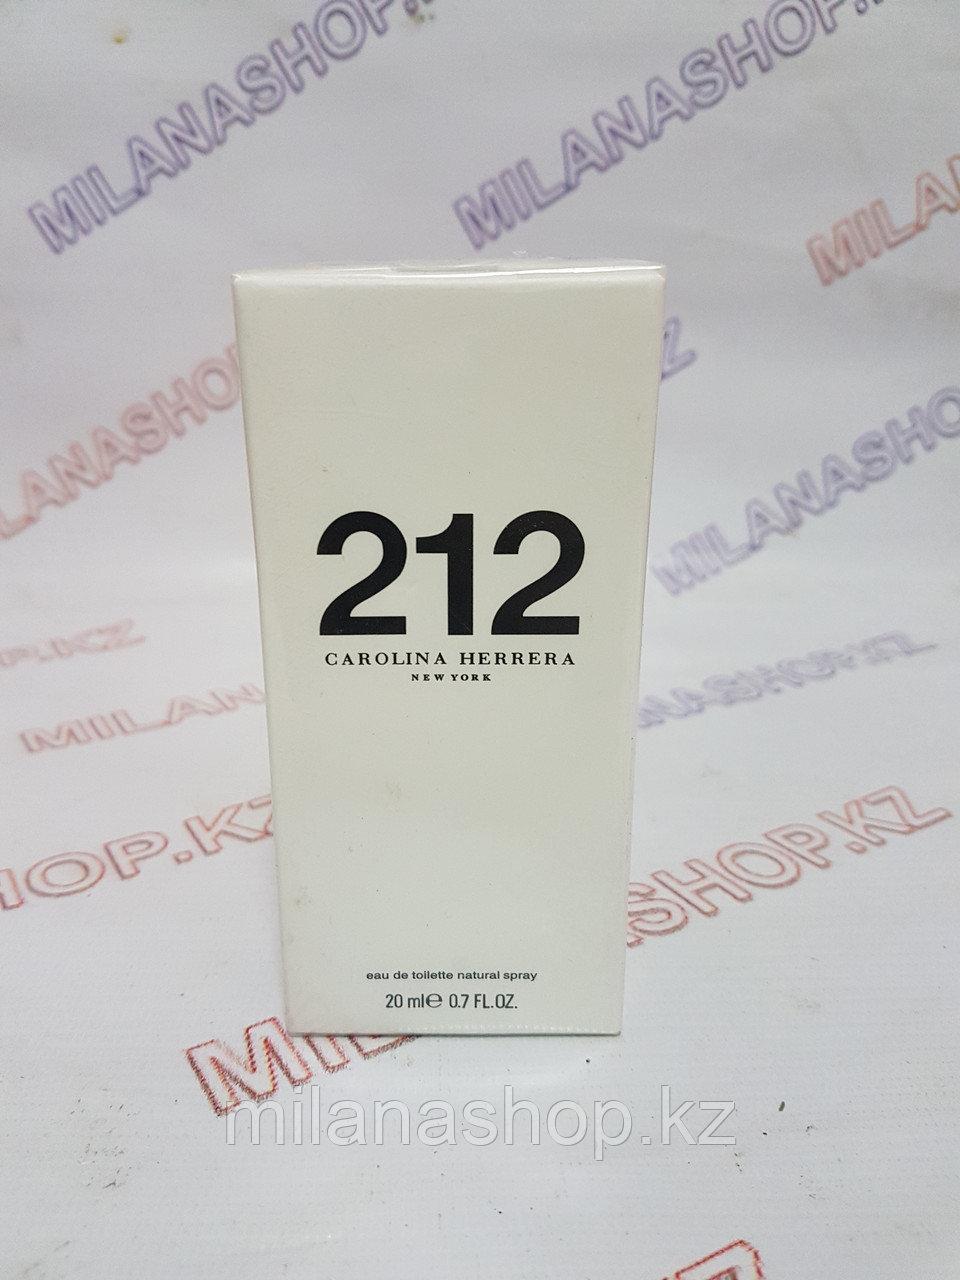 212 Carolina herrera Женские Мини ( 20 мг )